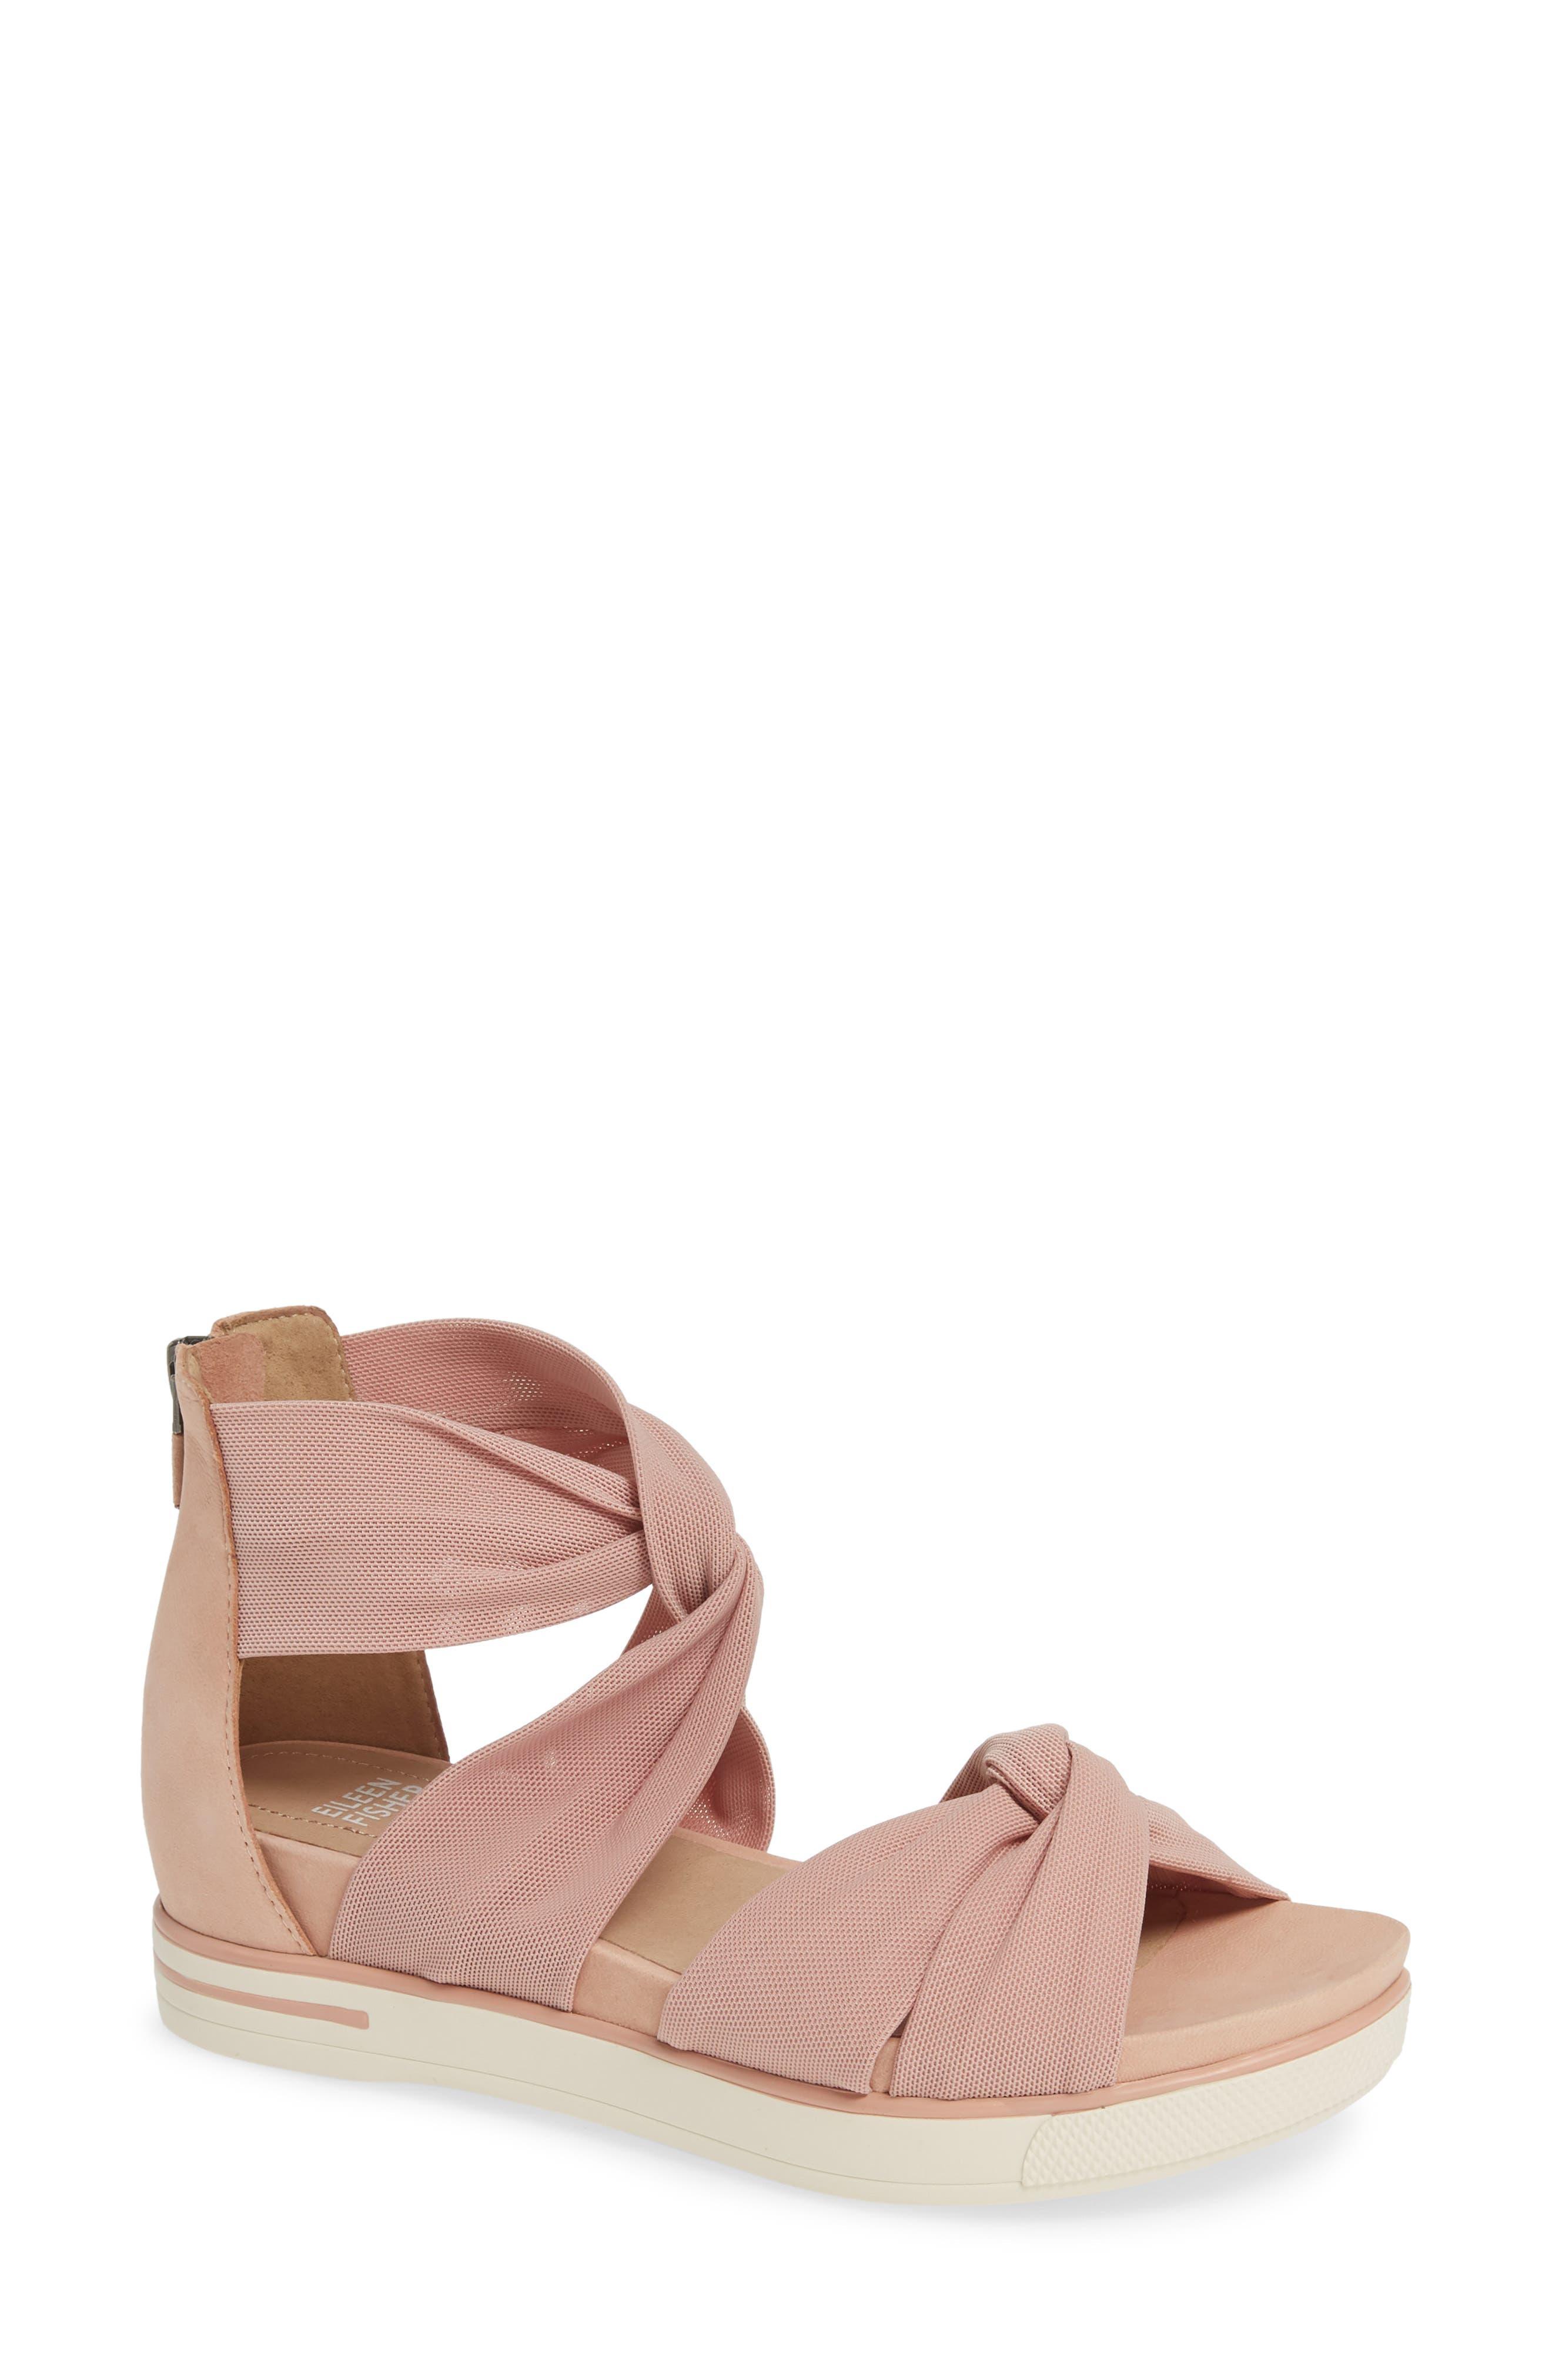 Eileen Fisher Zanya Sandal, Pink